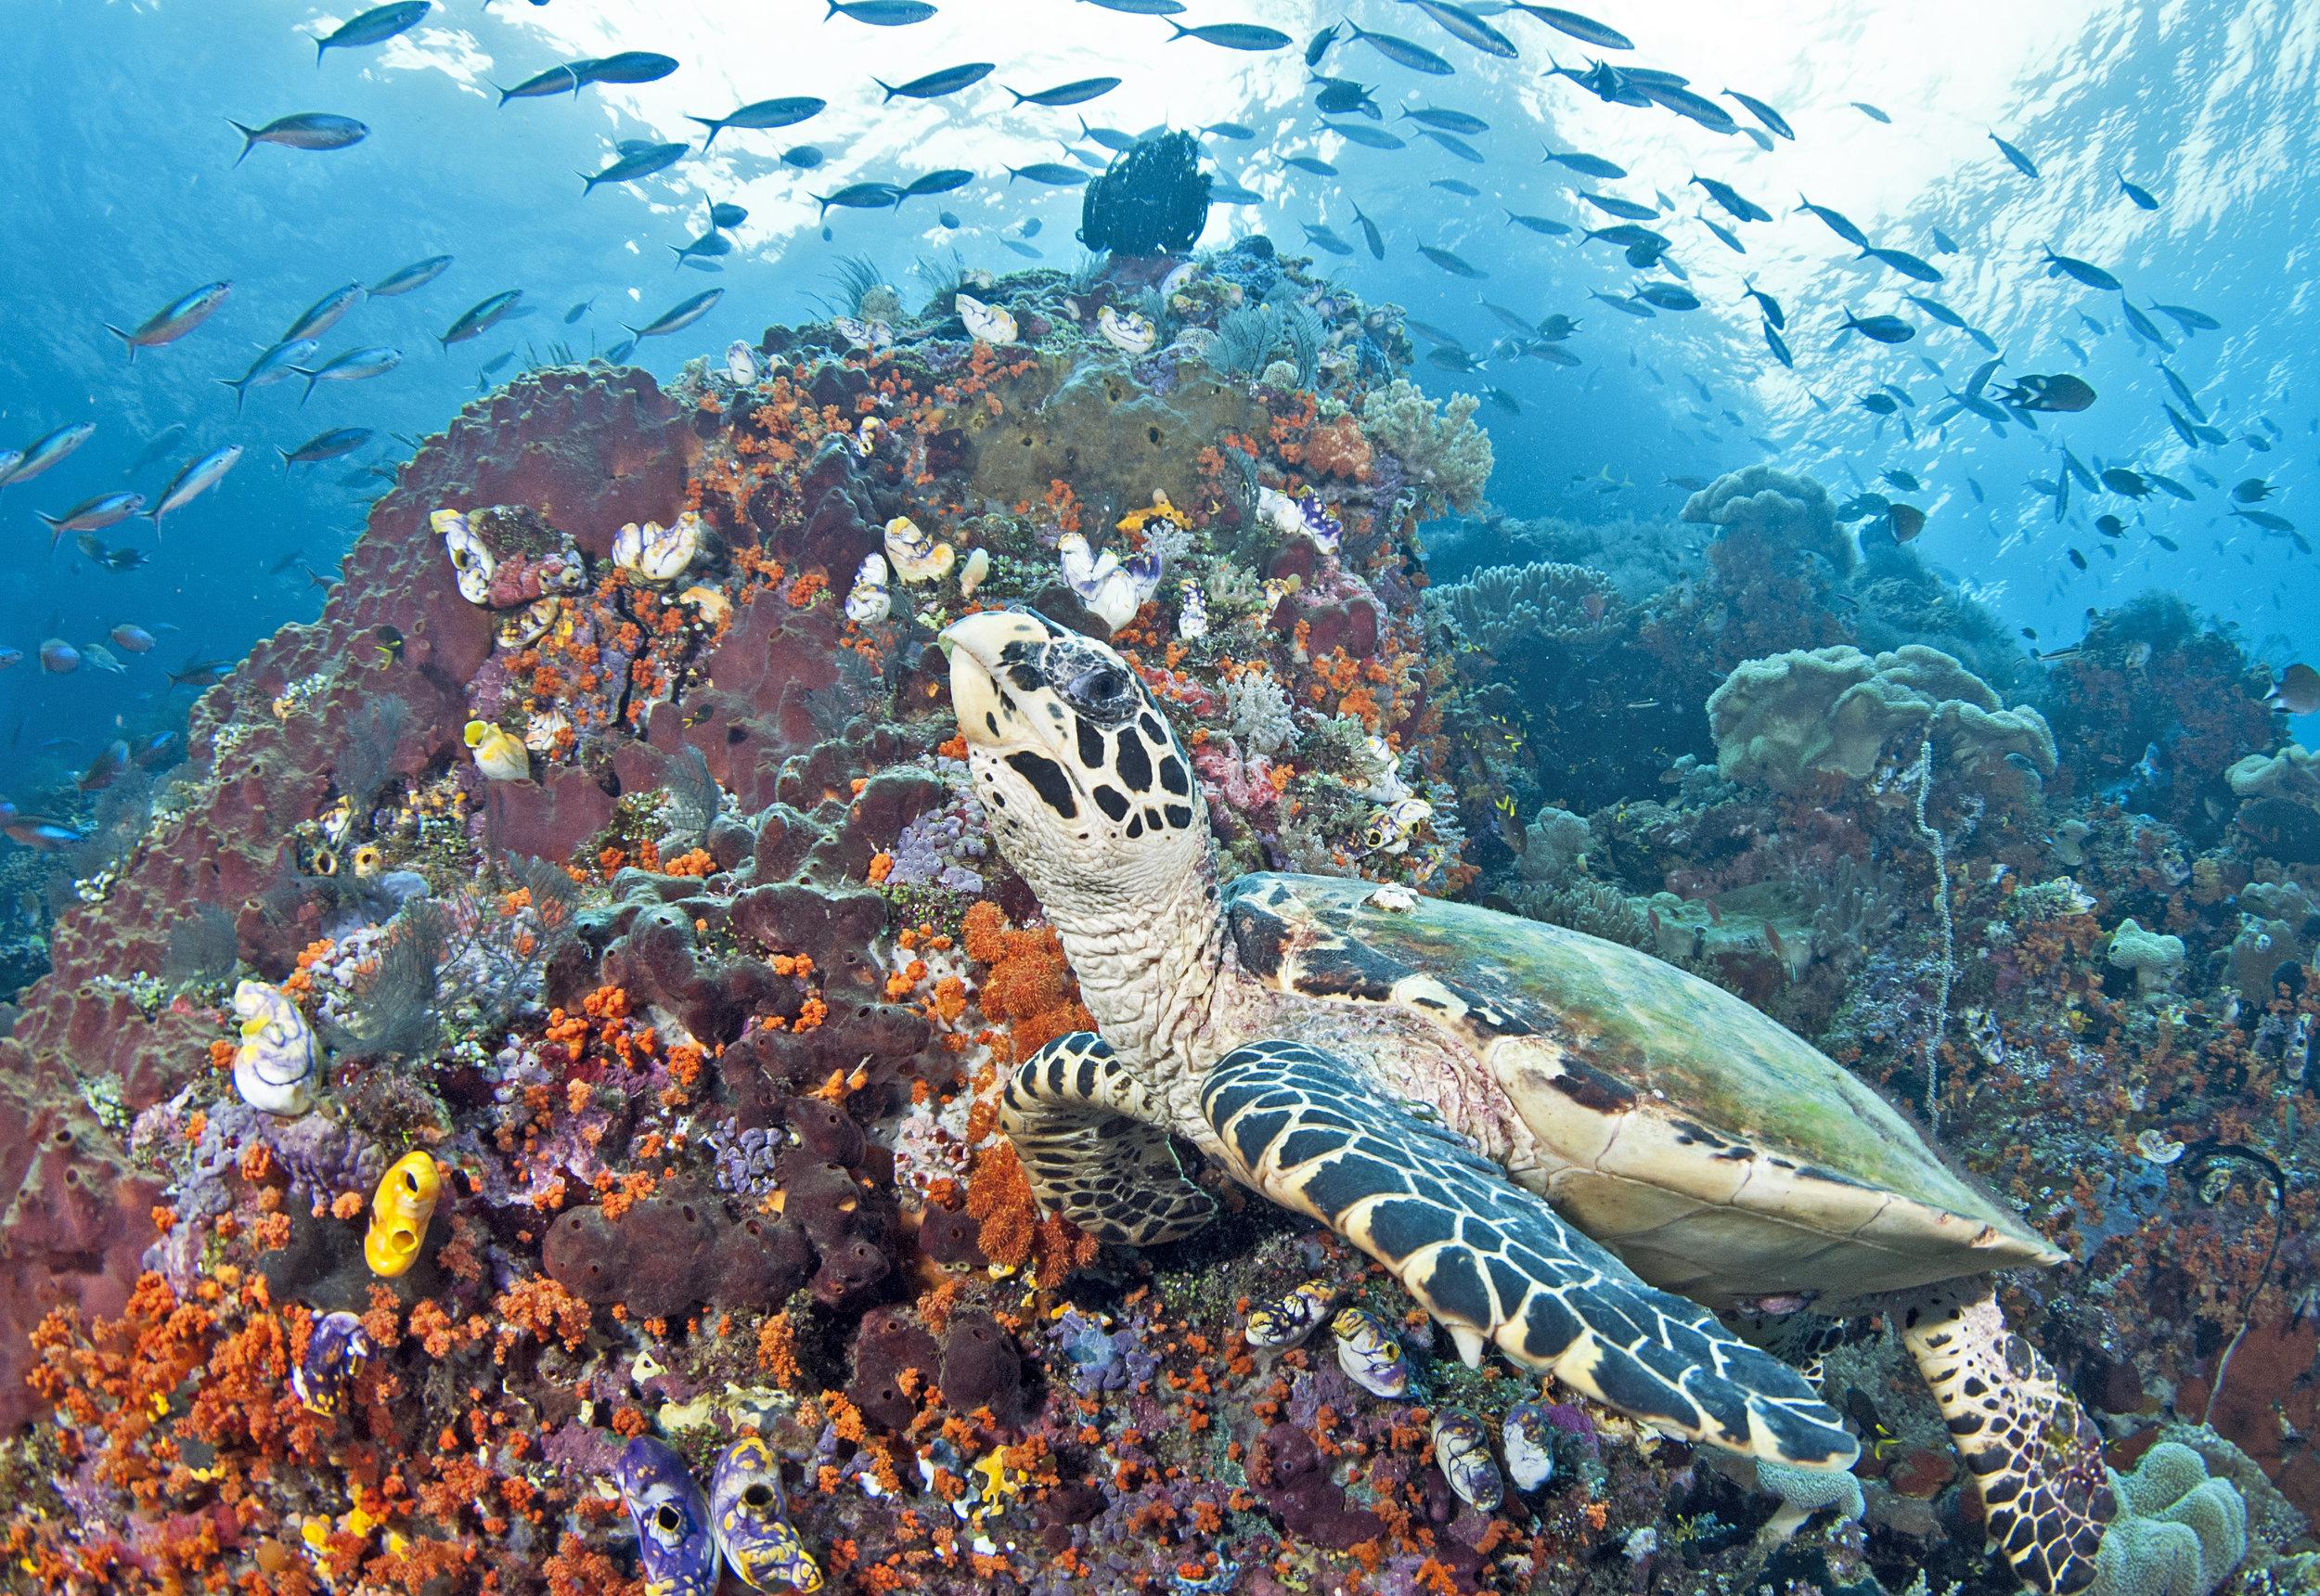 TURTLE, RAJA AMPAT, INDONESIA CREDIT: JAYNE JENKINS / coral reef image bank